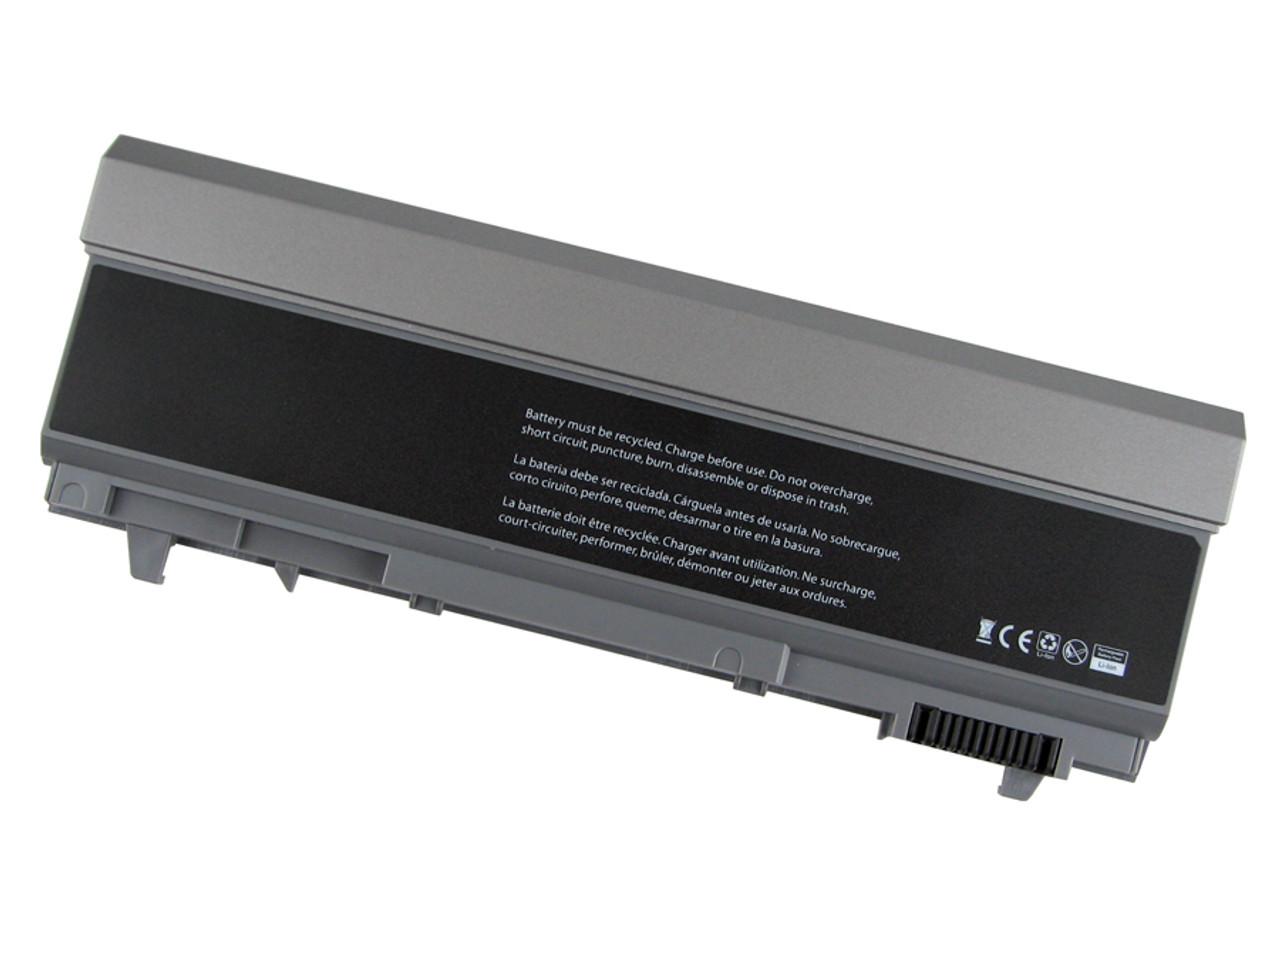 Dell Latitude E6410 E6510 9 cell battery